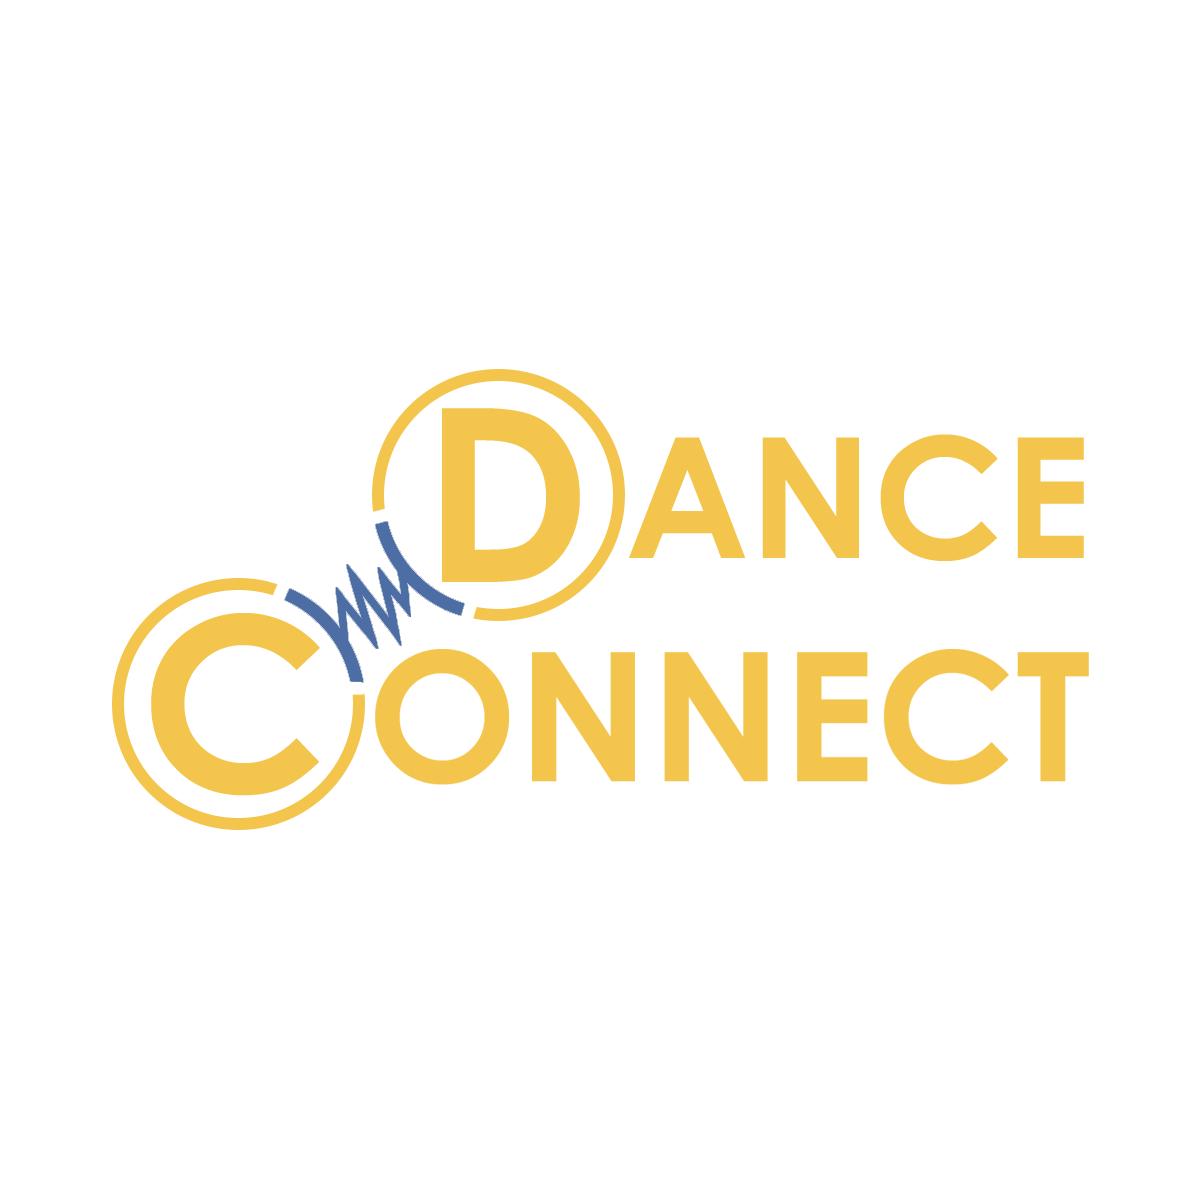 Разработка лого для спортивного портала www.danceconnect.ru фото f_1265b437d2c8d0ee.png